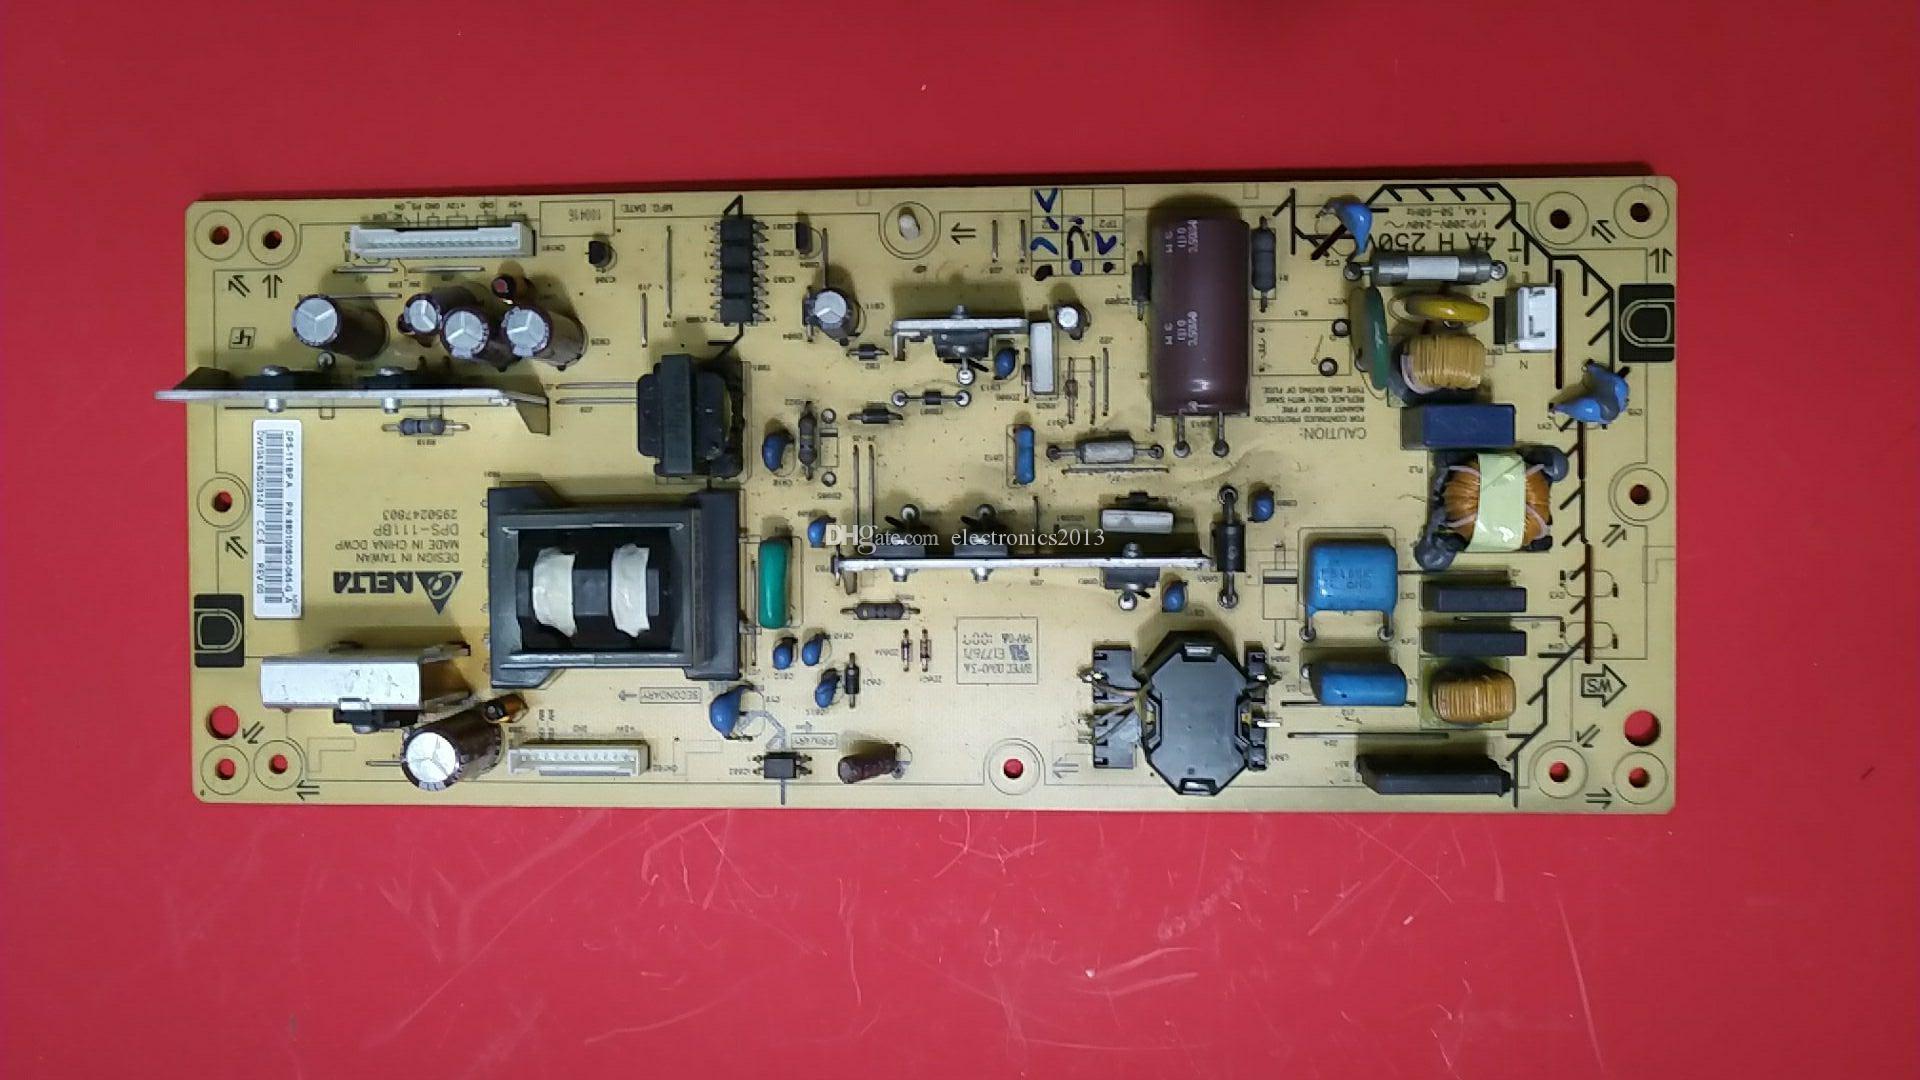 Free Shipping Original LCD Monitor Power Supply Board LED Board PCB Unit For Sony KLV- 26BX205 DPS-111BP 2950247803